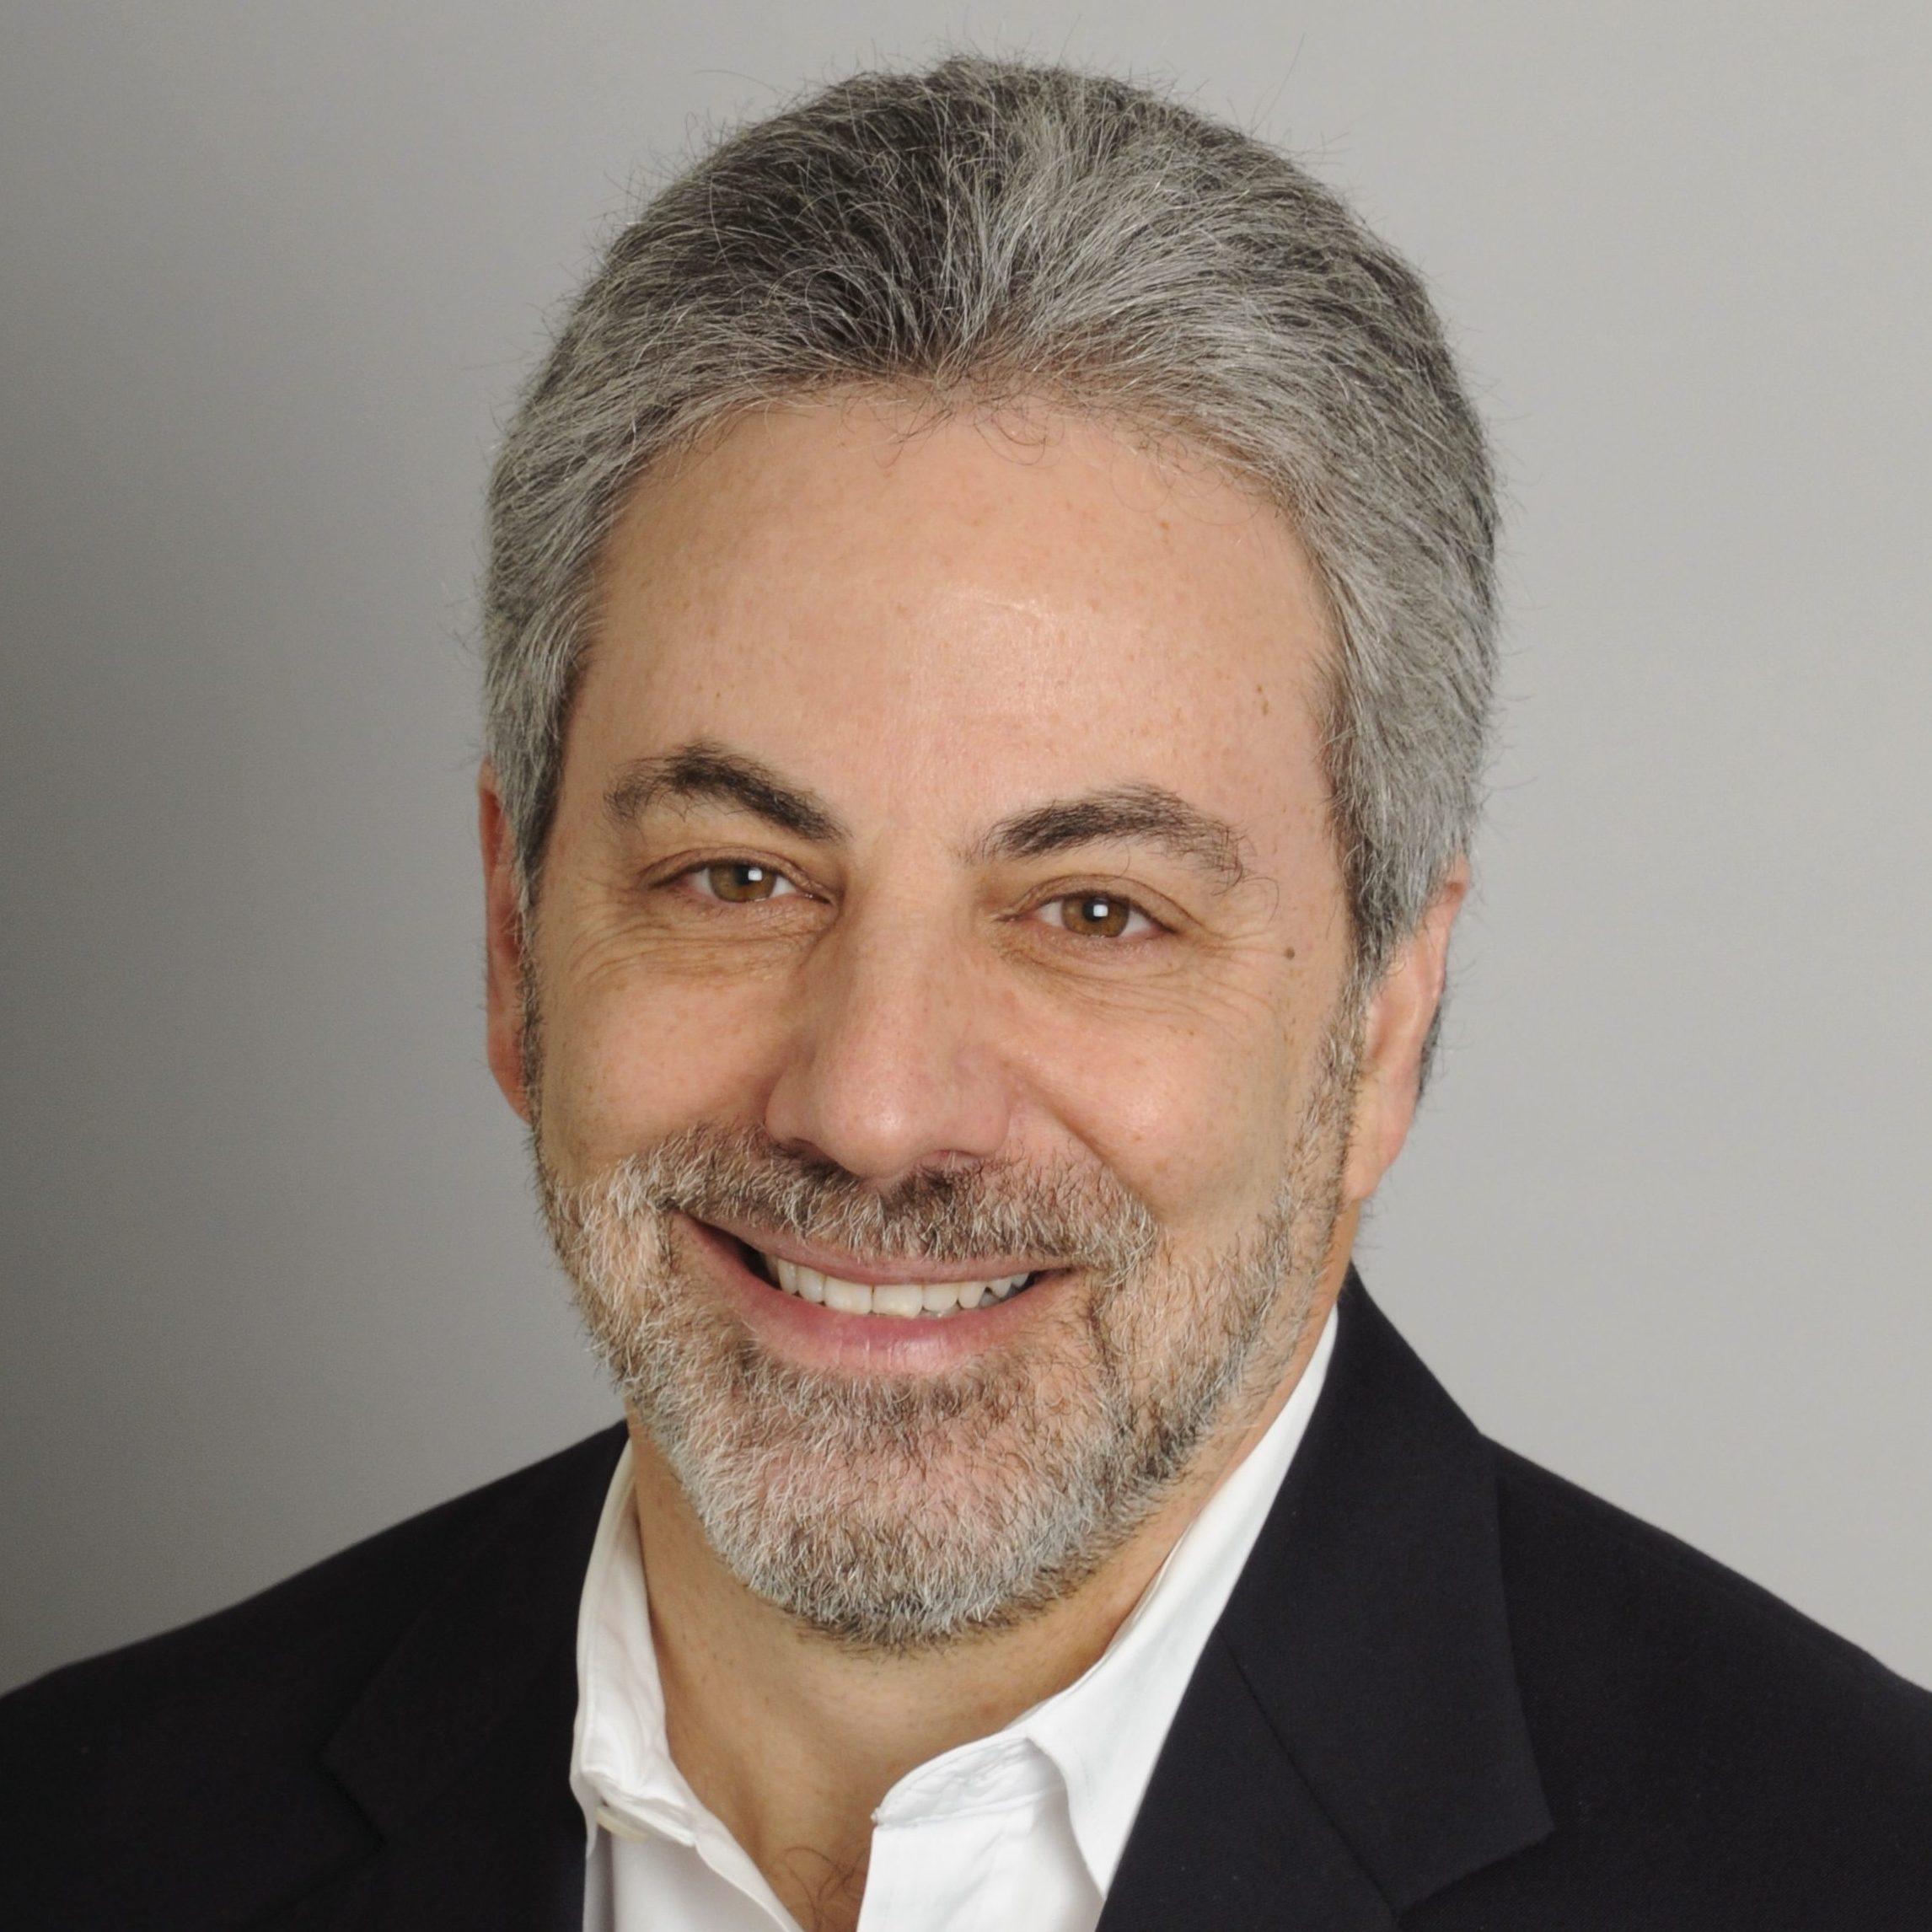 David Yoffie